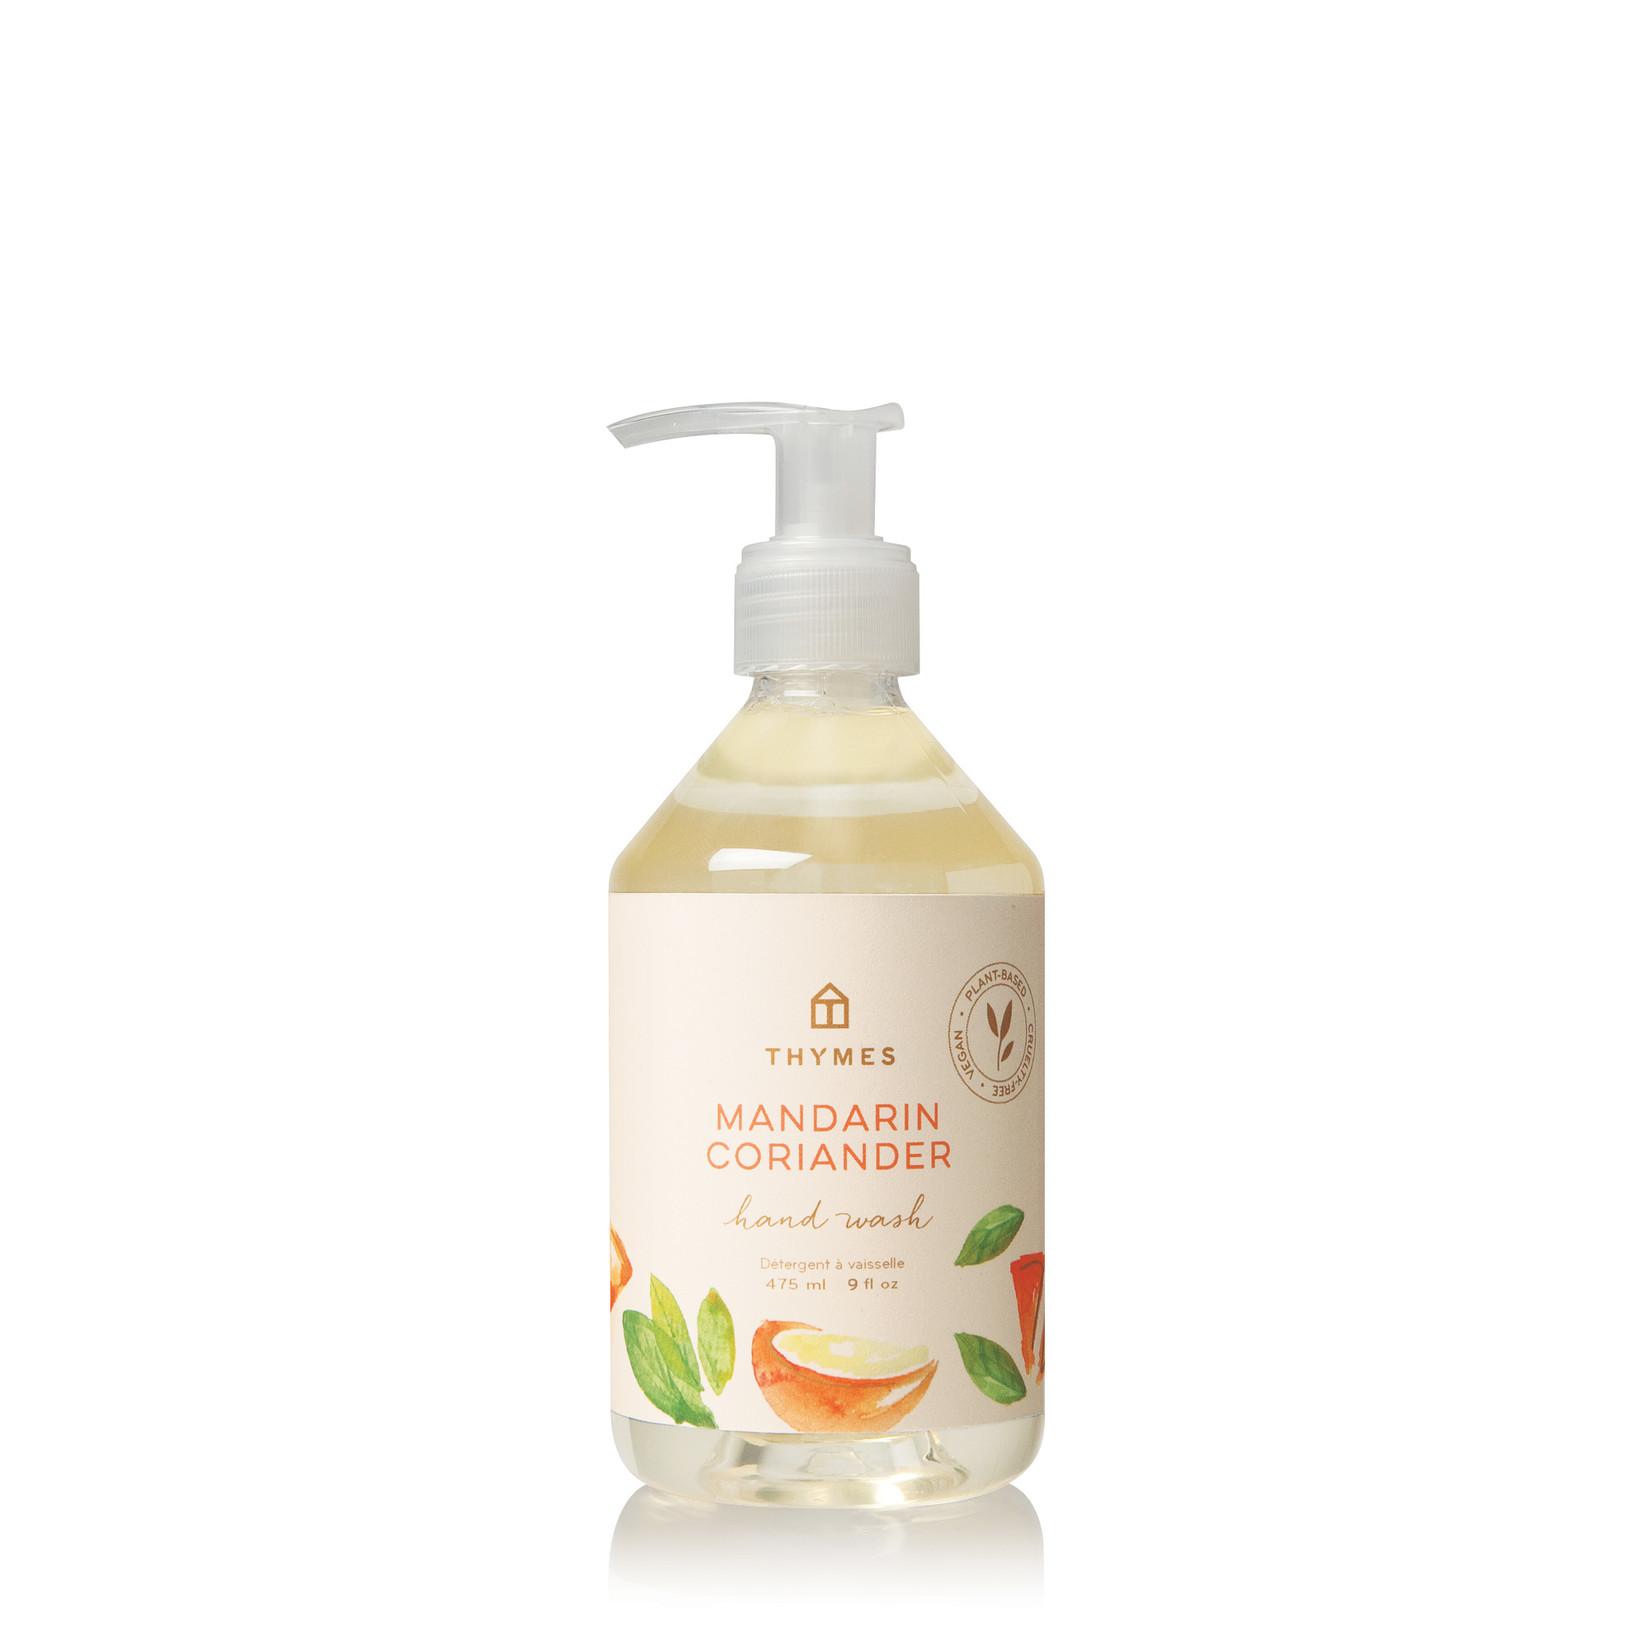 Thymes Mandarin Coriander Hand Wash